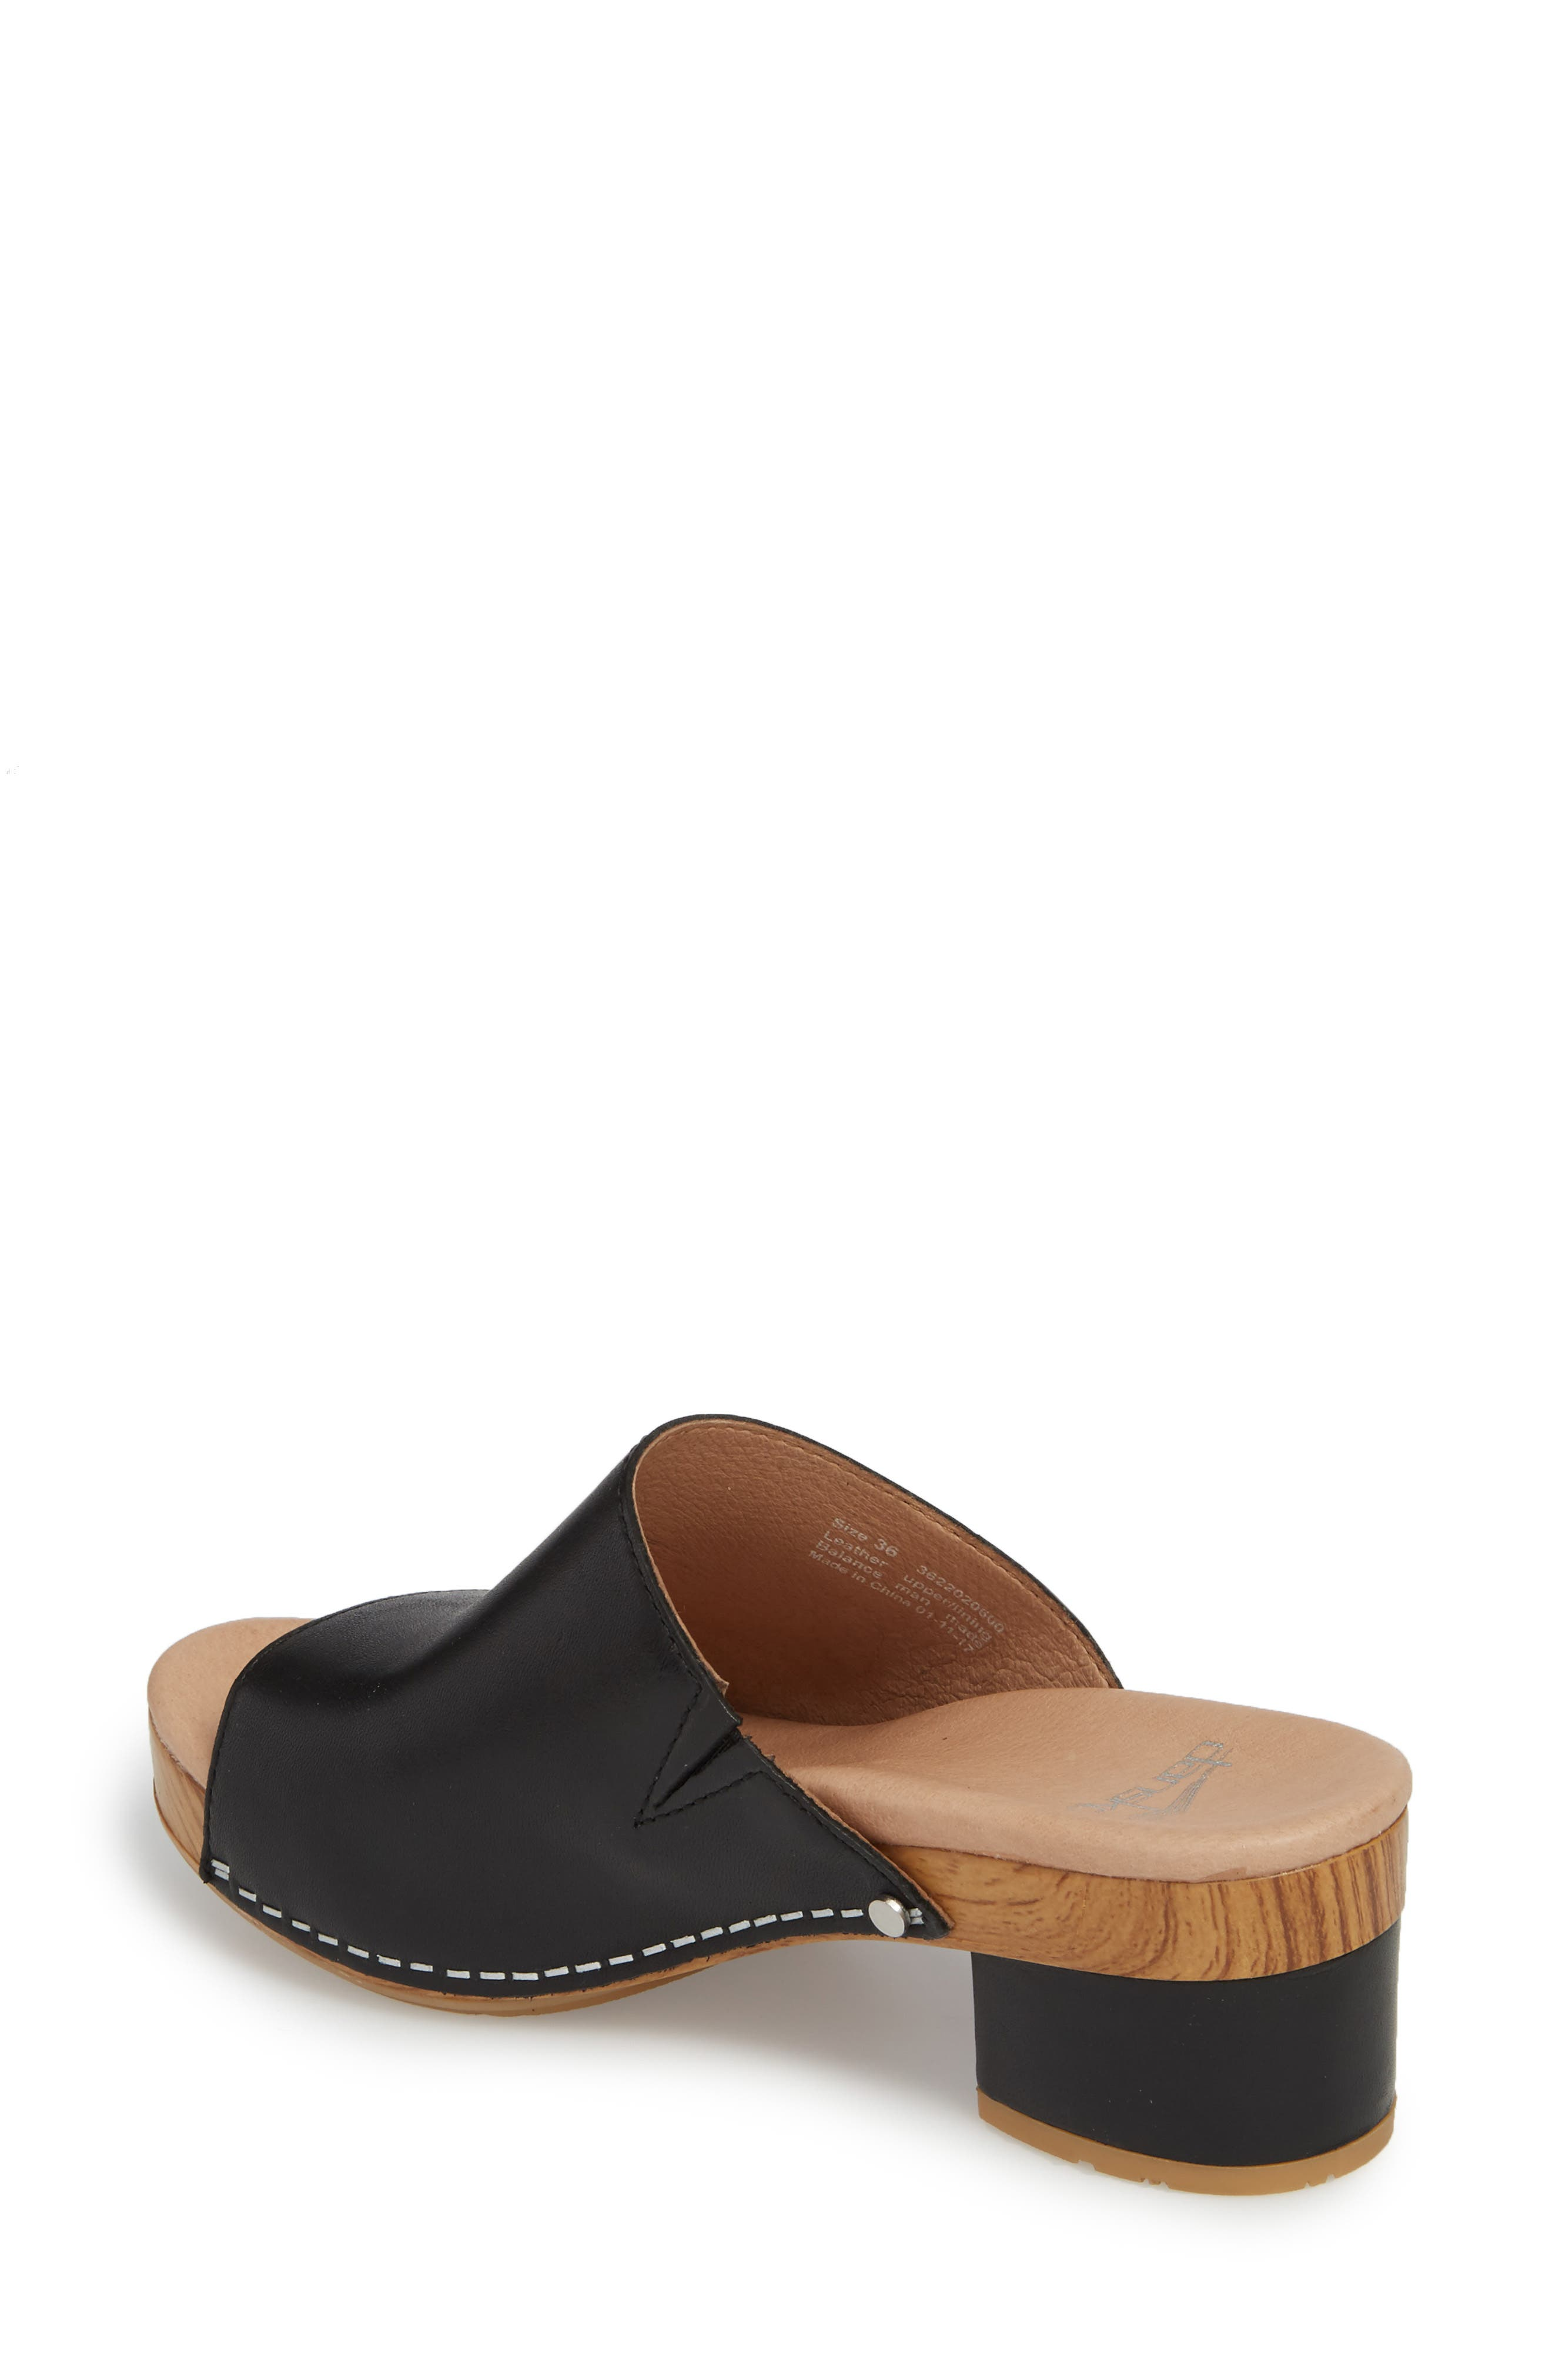 Maci Mule Sandal,                             Alternate thumbnail 2, color,                             BLACK LEATHER